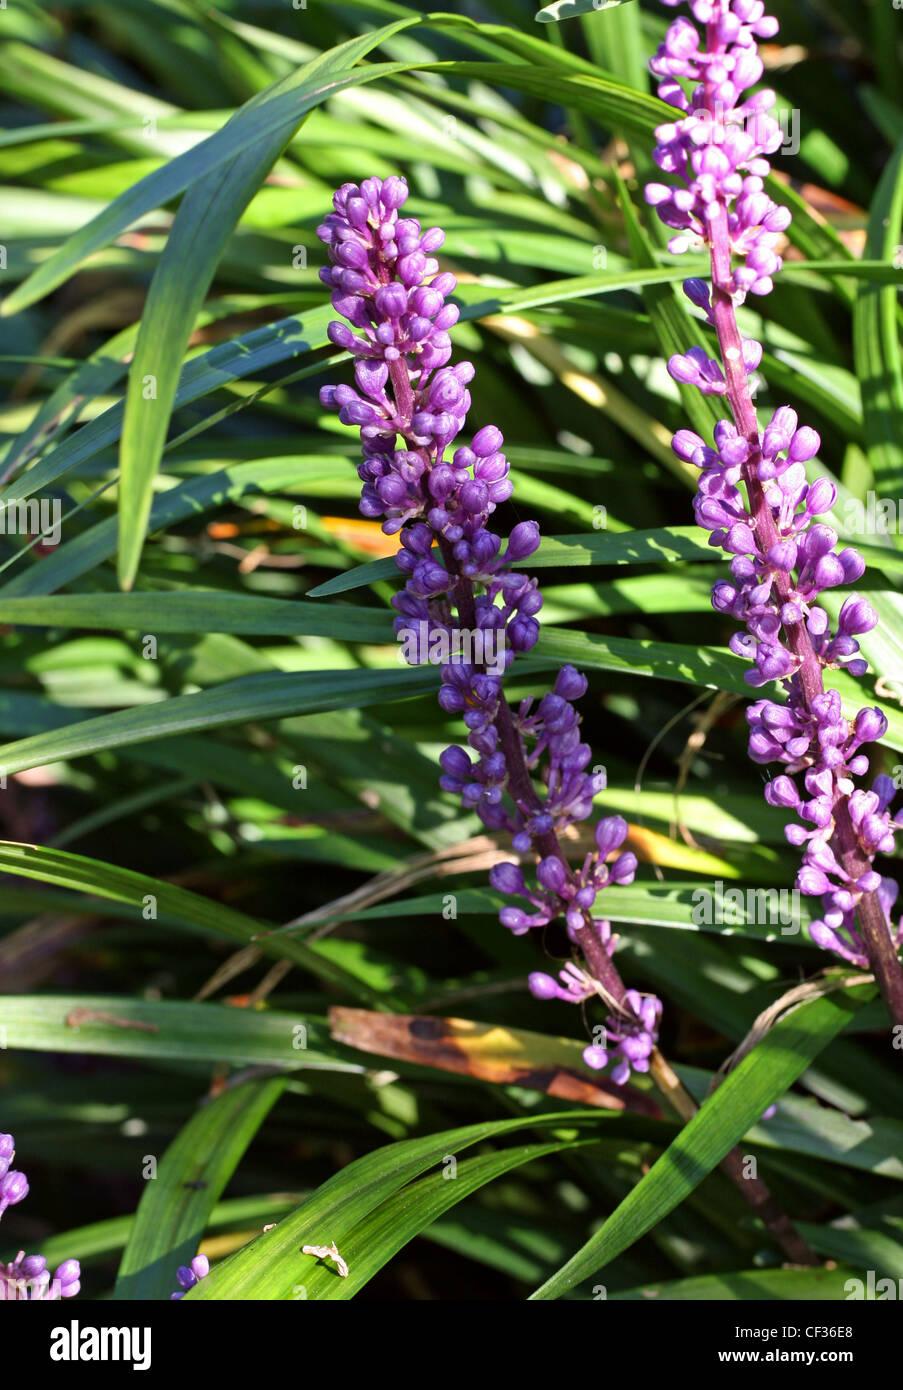 Liriope oder Lilyturf, Liriope Platyphylla, Nolinoideae, Asparagaceae. Zuvor in Convallariaceae und Ruscaceae. Stockbild